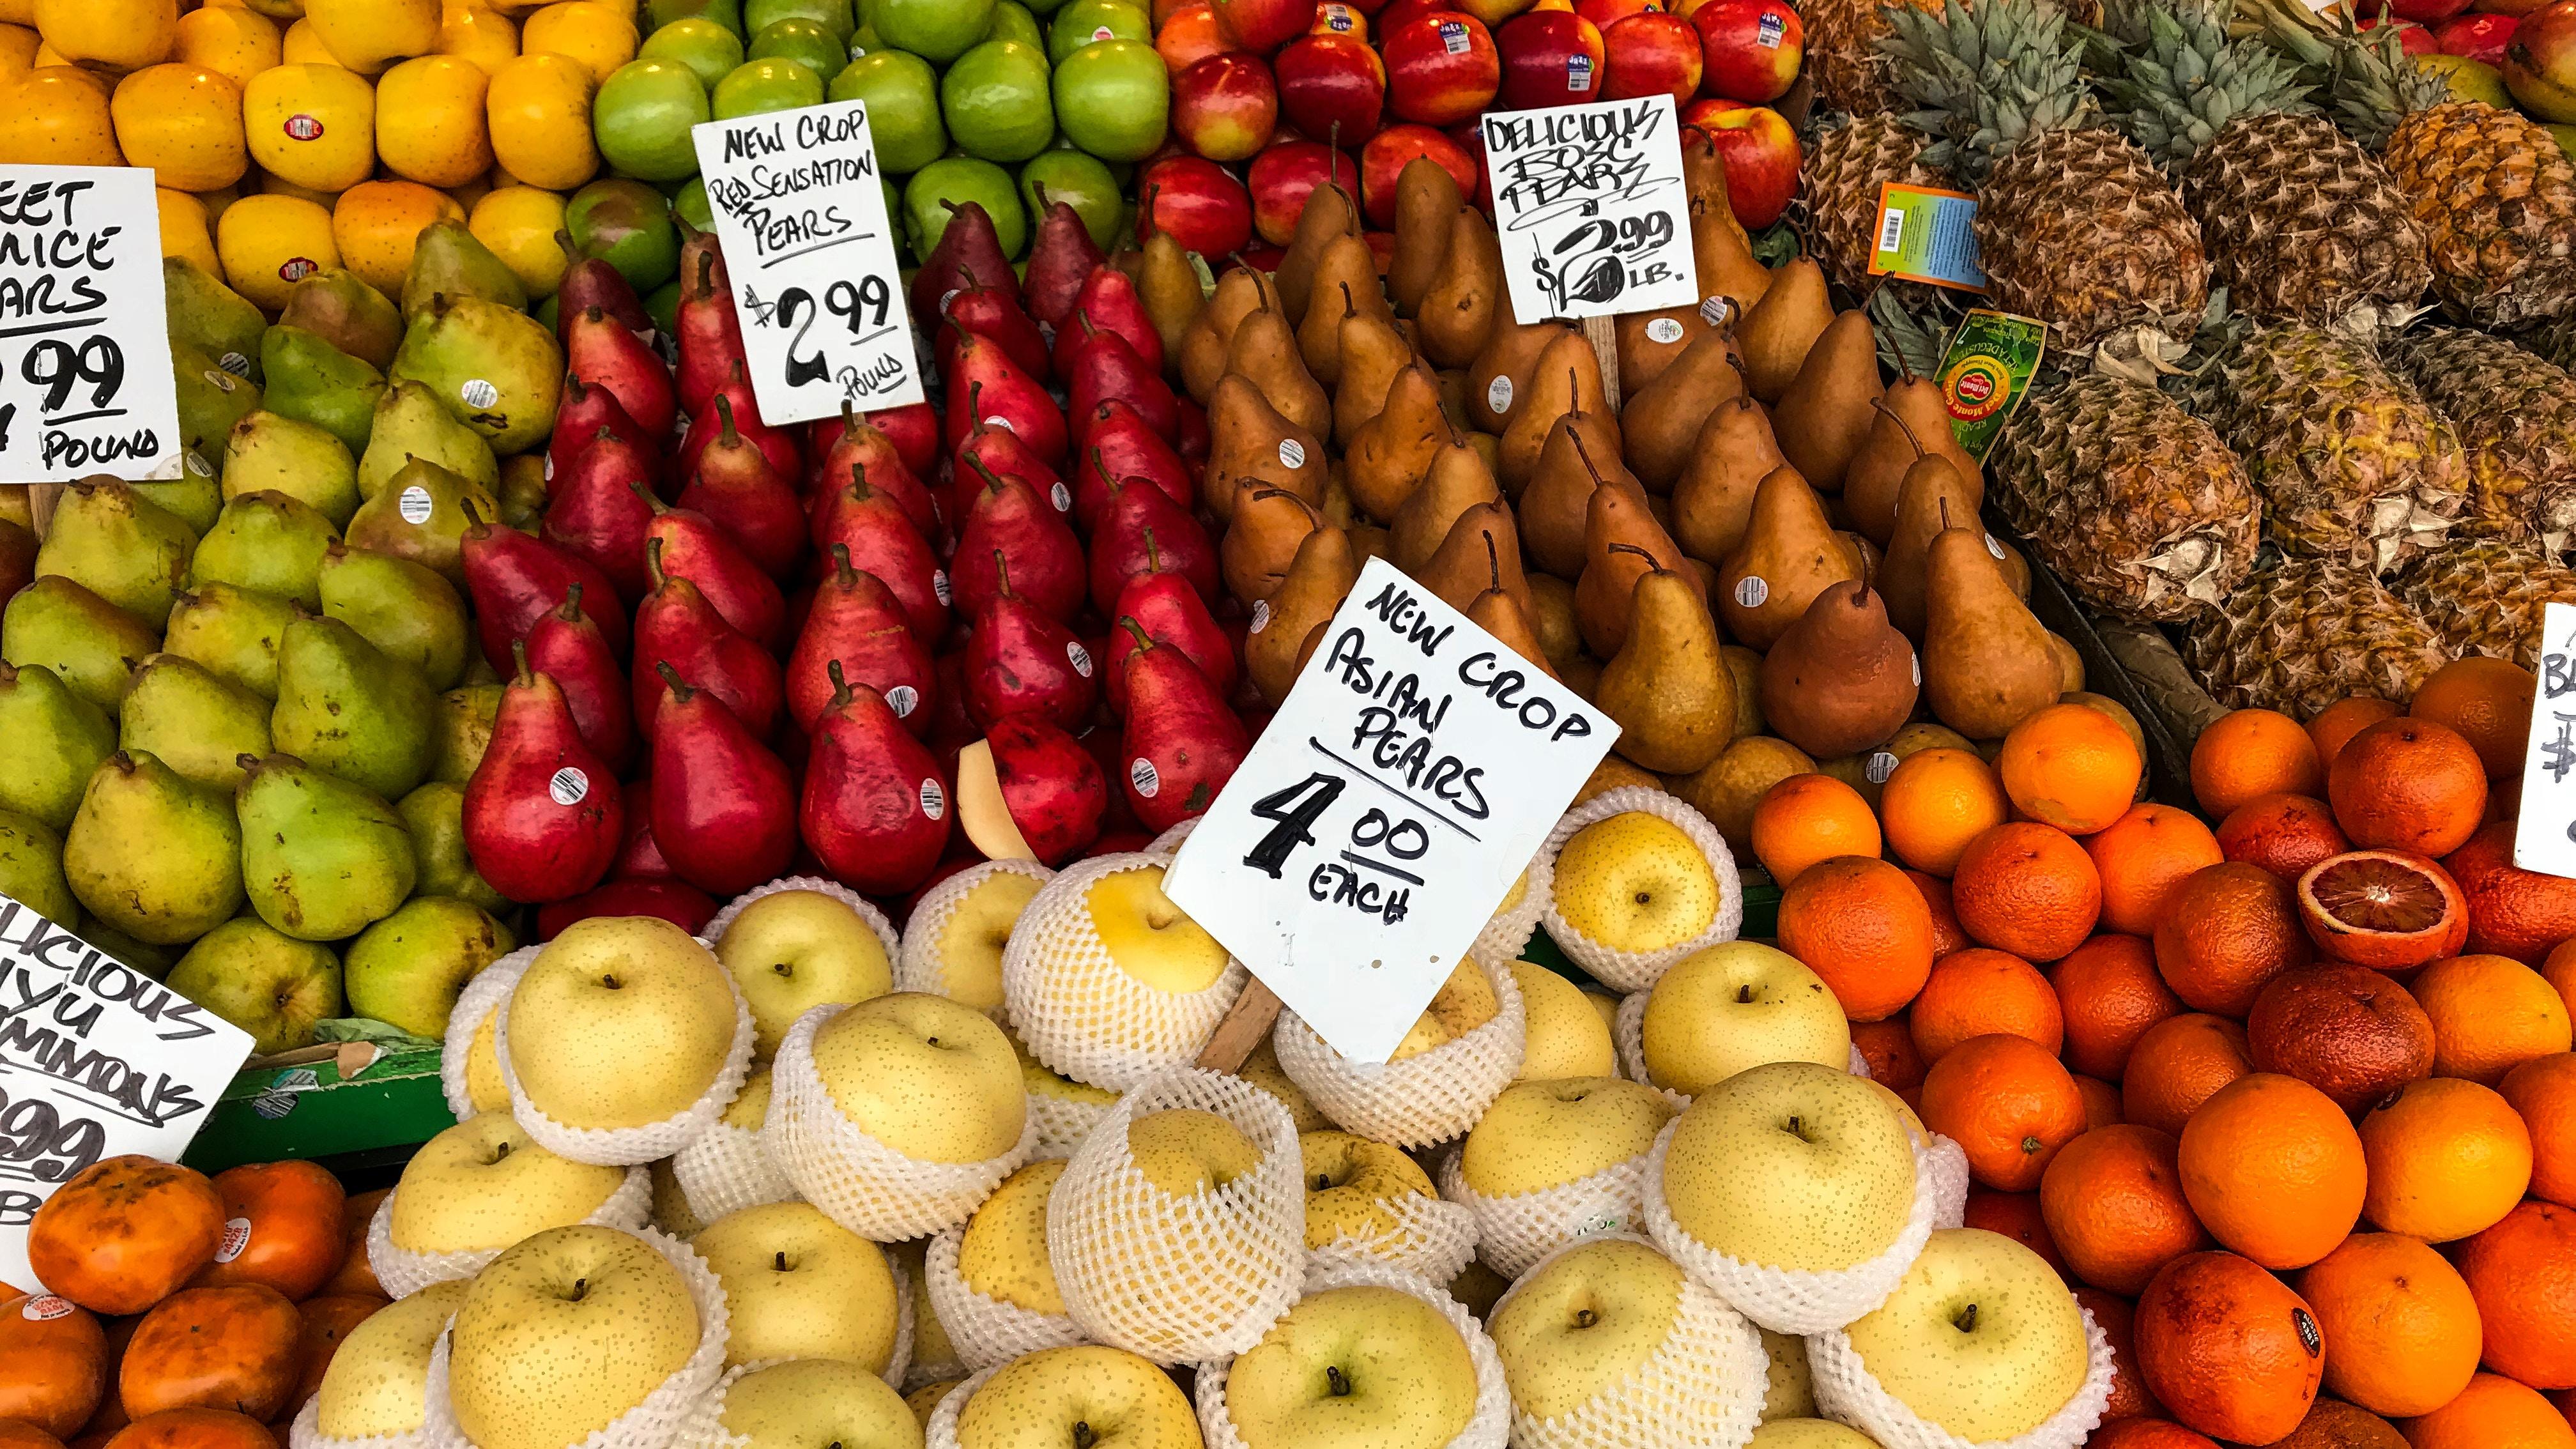 rajiv perera 467036 - Veggie Vitality: Preserving the freshness of our precious produce